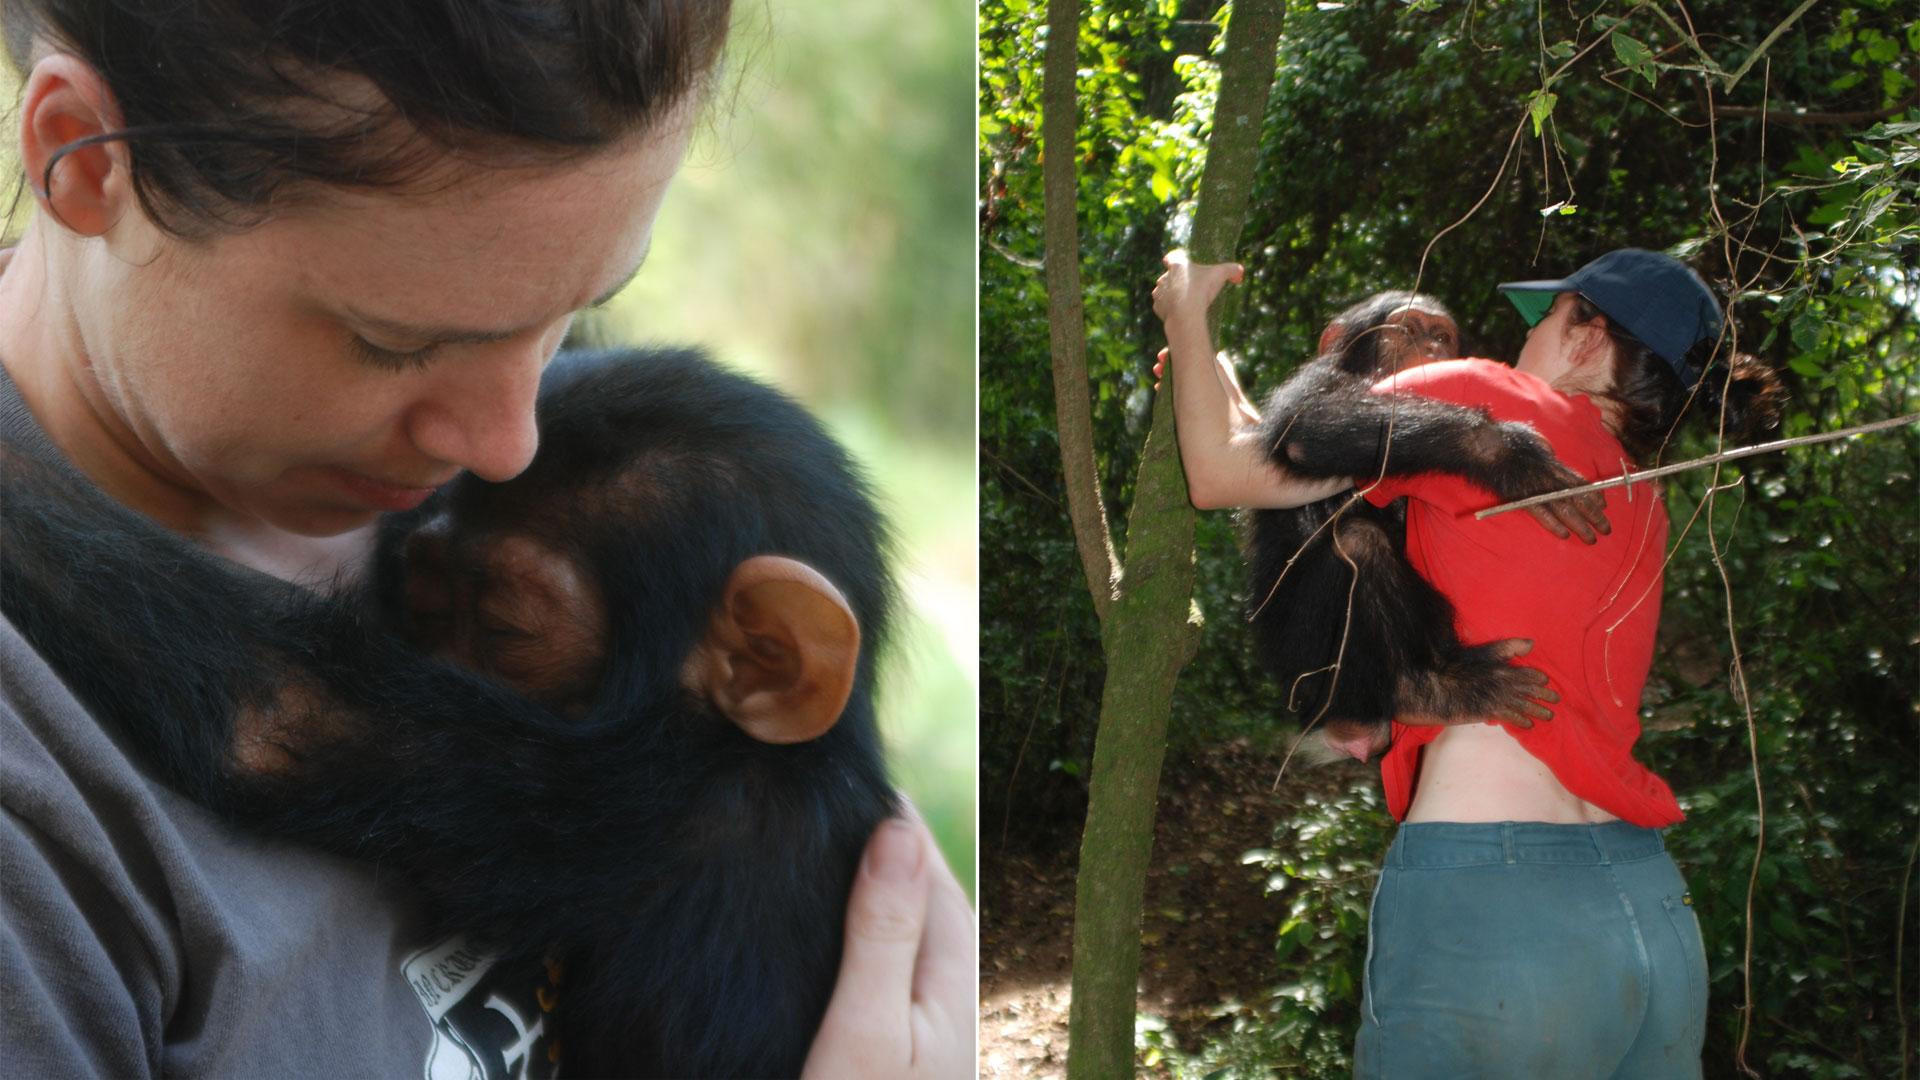 https://rfacdn.nz/zoo/assets/media/mikaylie-chimp-congo-gallery-2.jpg